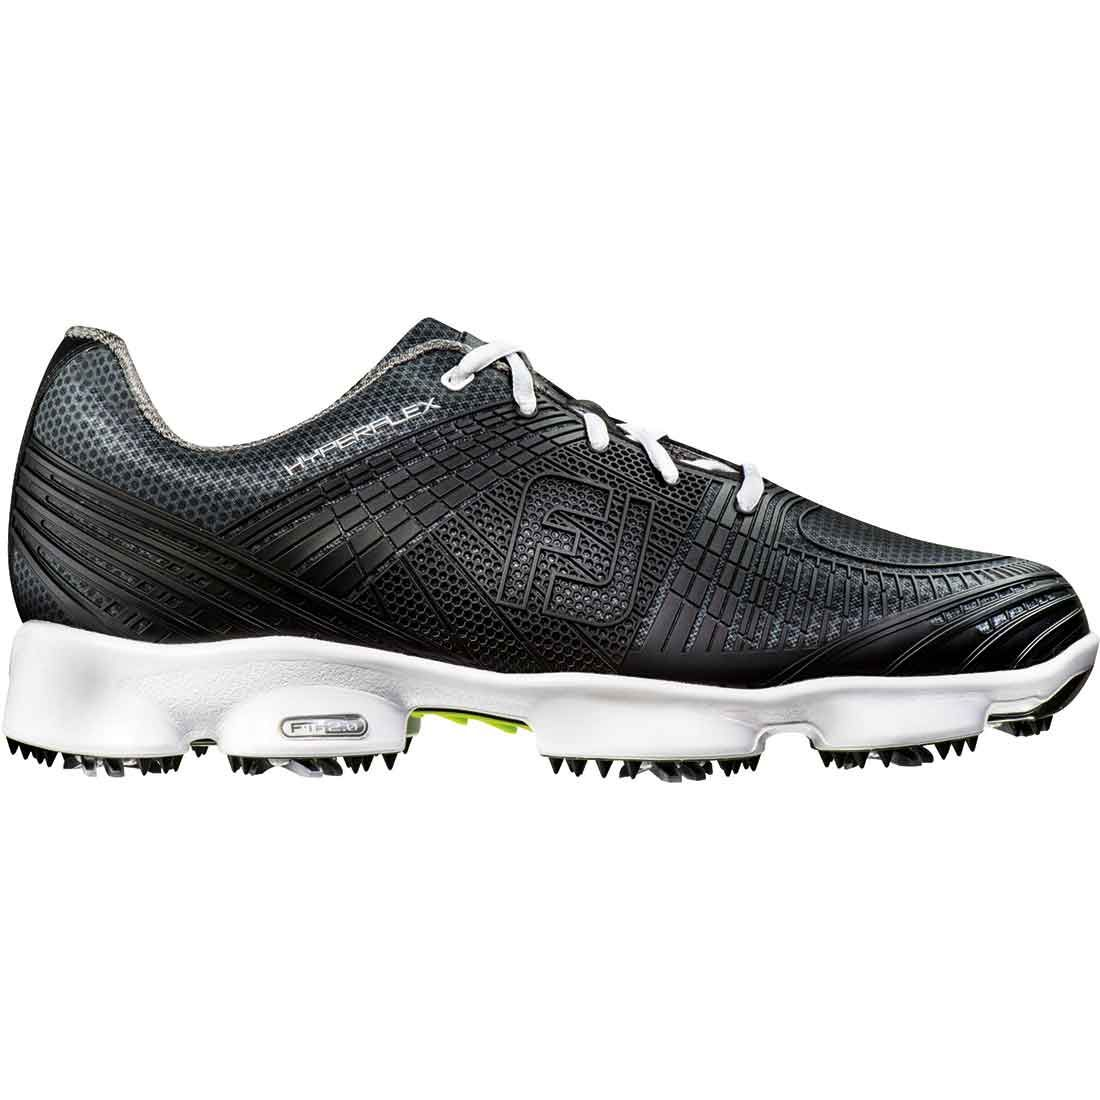 FootJoy HyperFlex II Golf Shoes Black